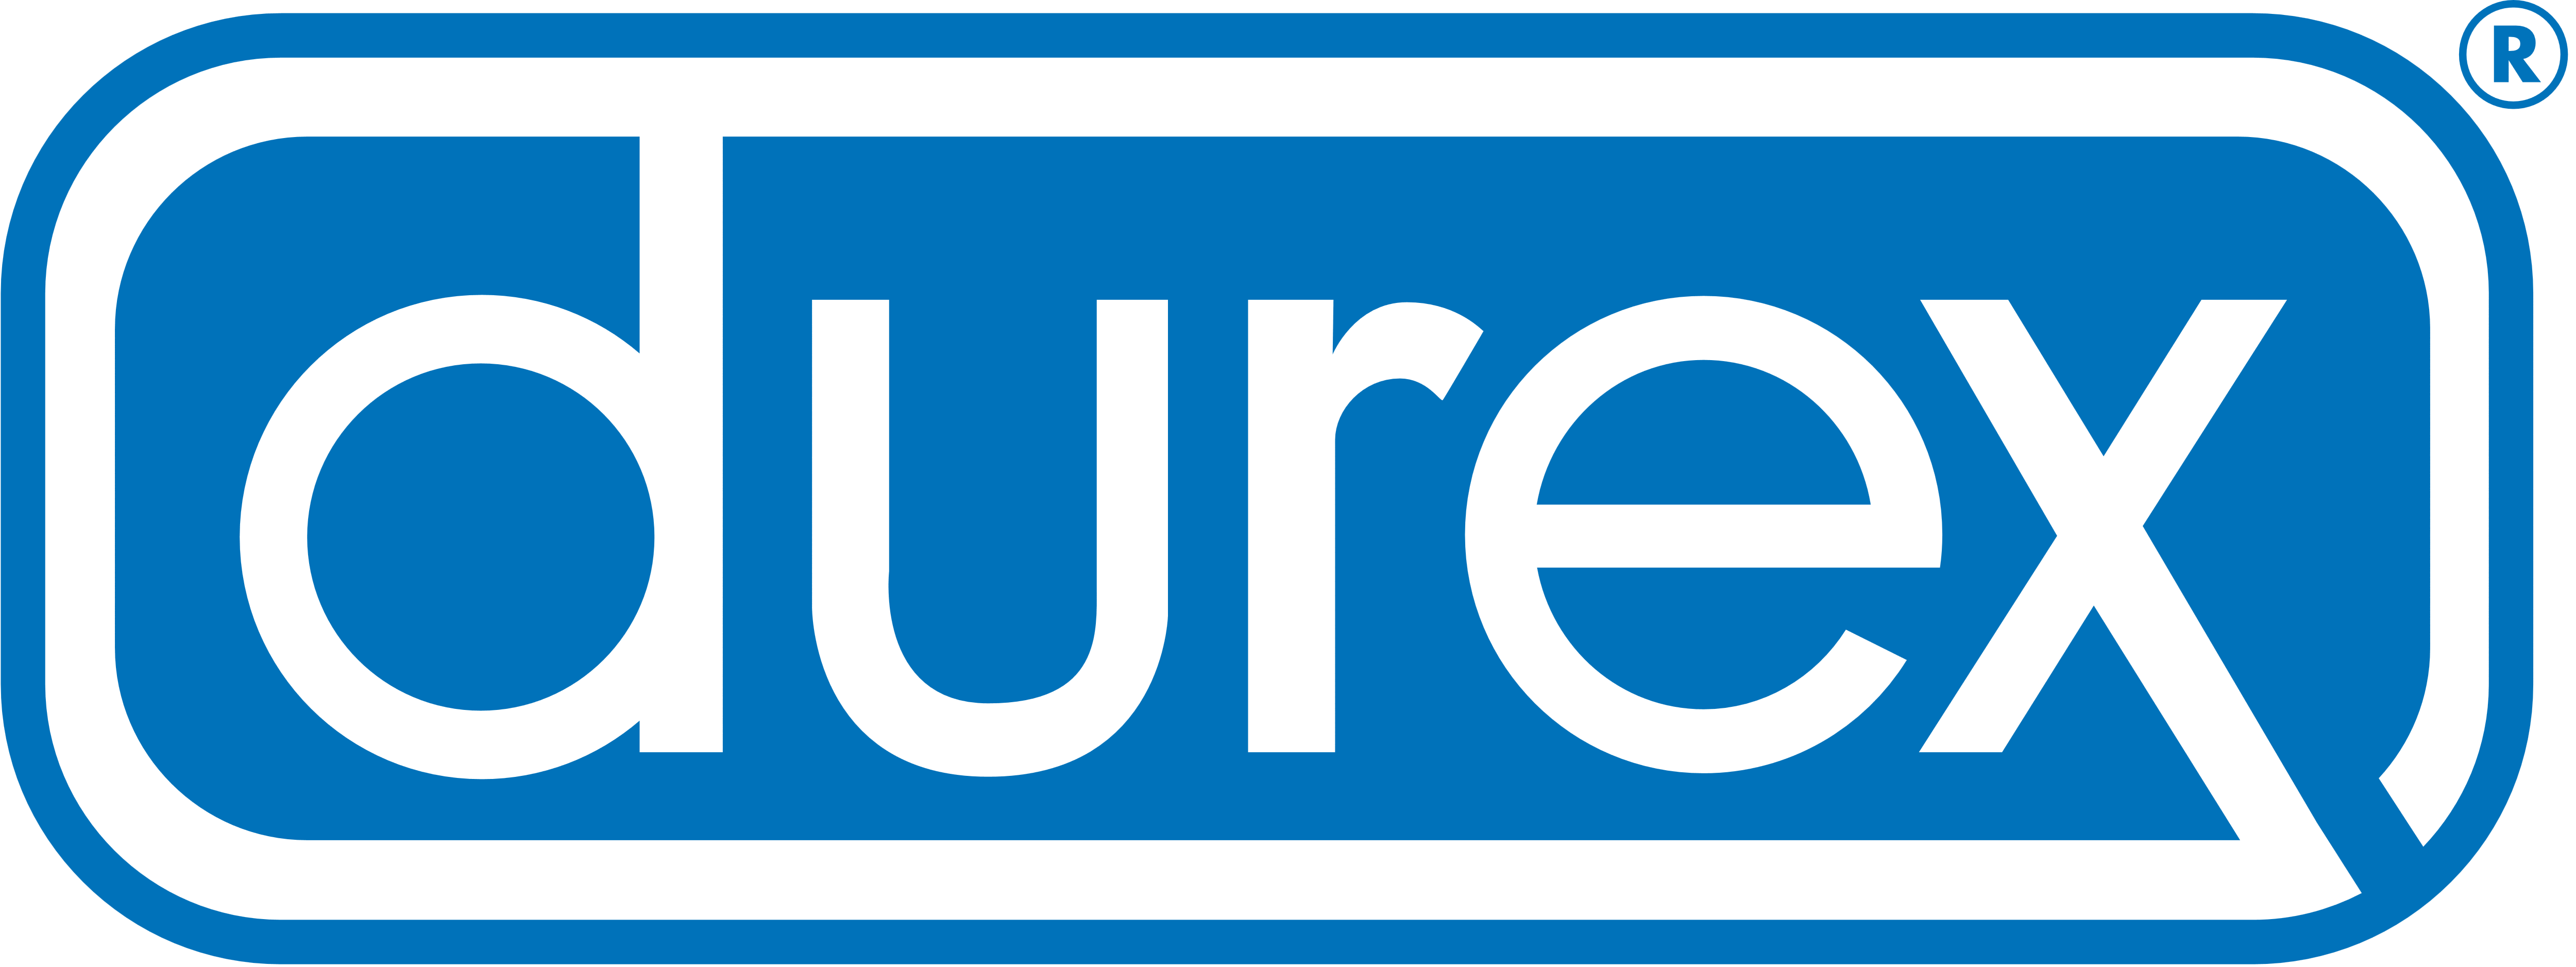 Durex Logos Download